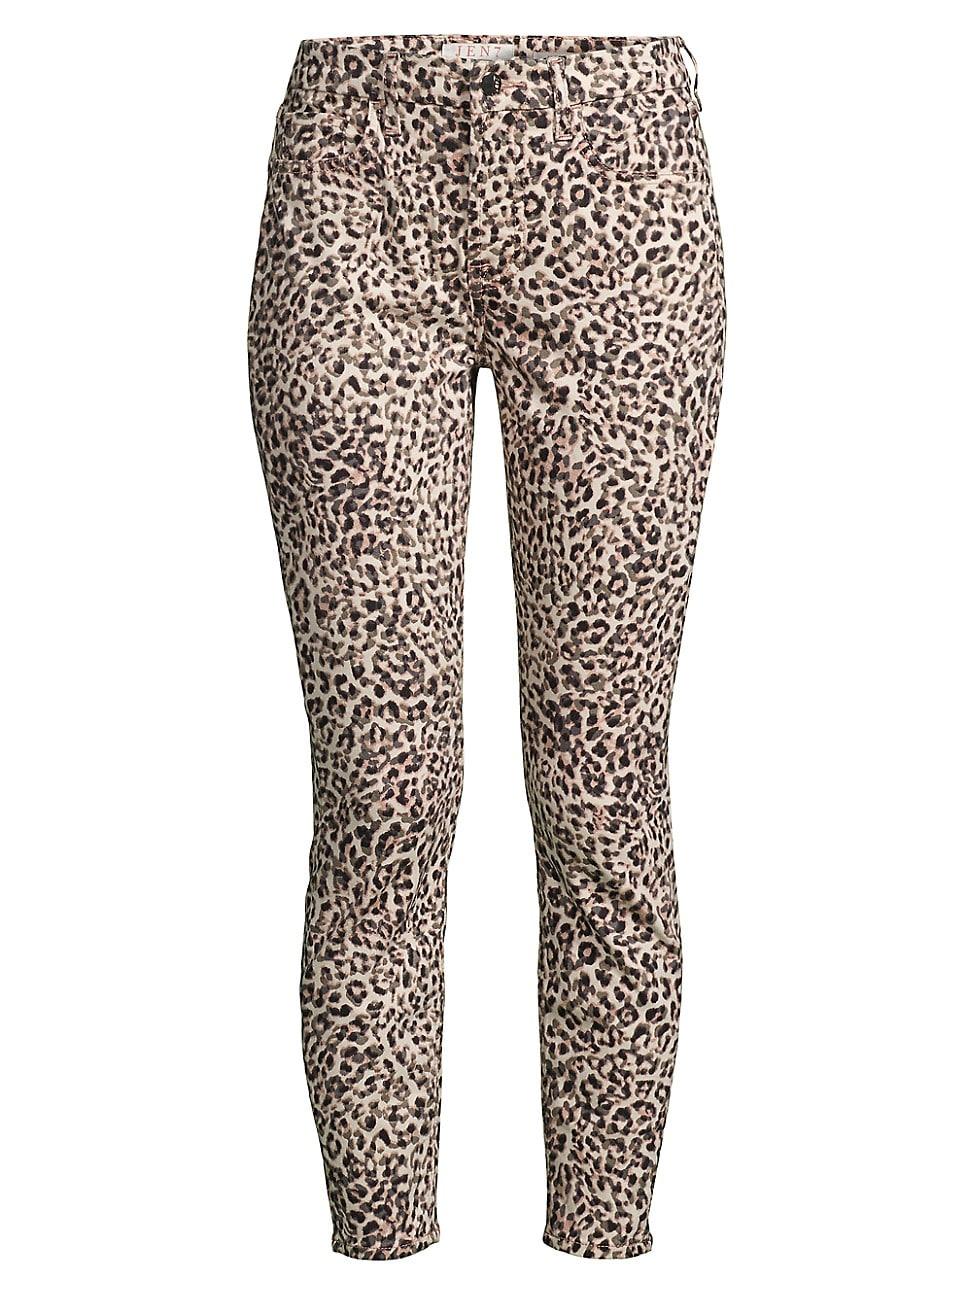 Jen7 By 7 For All Mankind Skinny jeans WOMEN'S ANKLE SKINNY JEANS